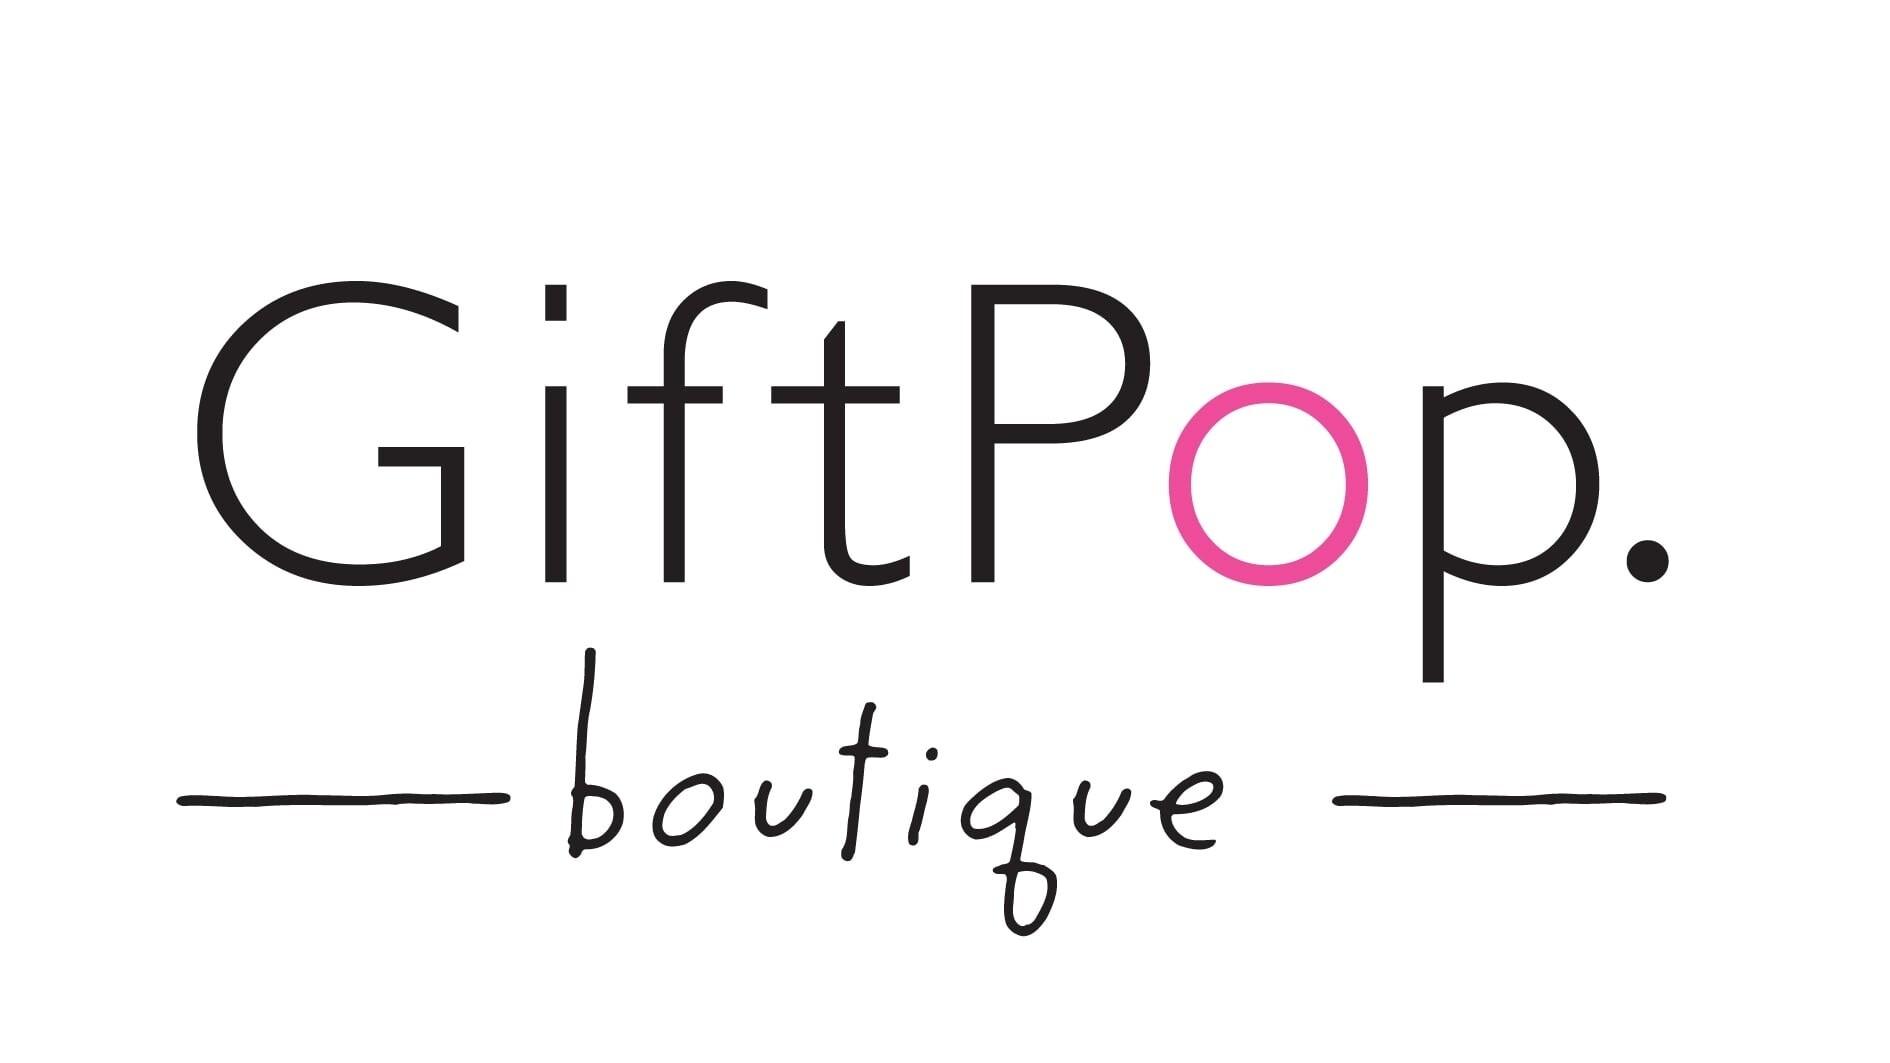 Giftpop Vouchers